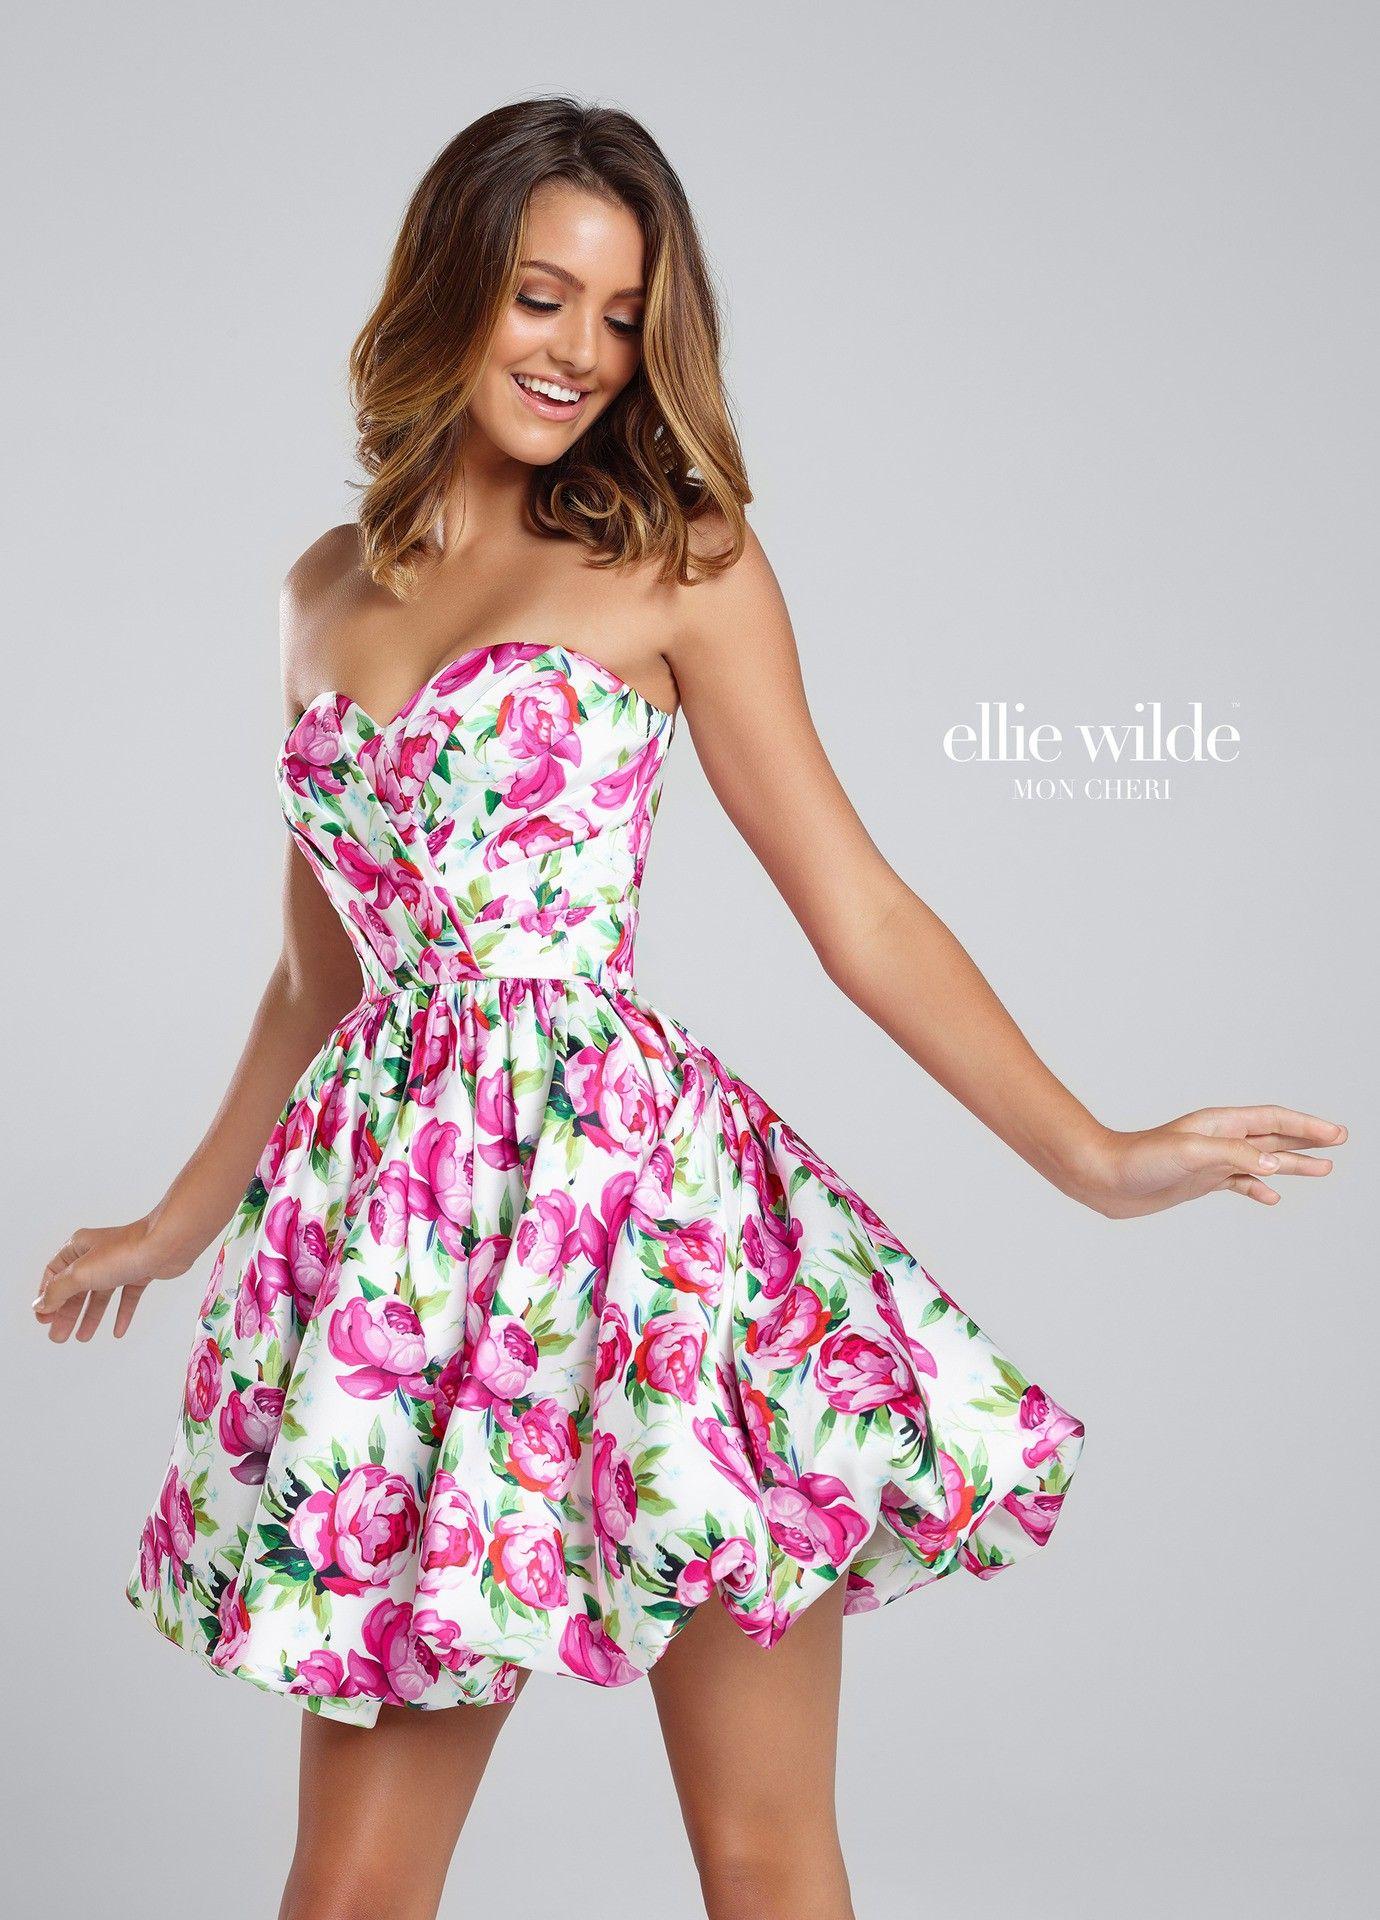 Ellie wilde ew is a cute short floral printed dress that